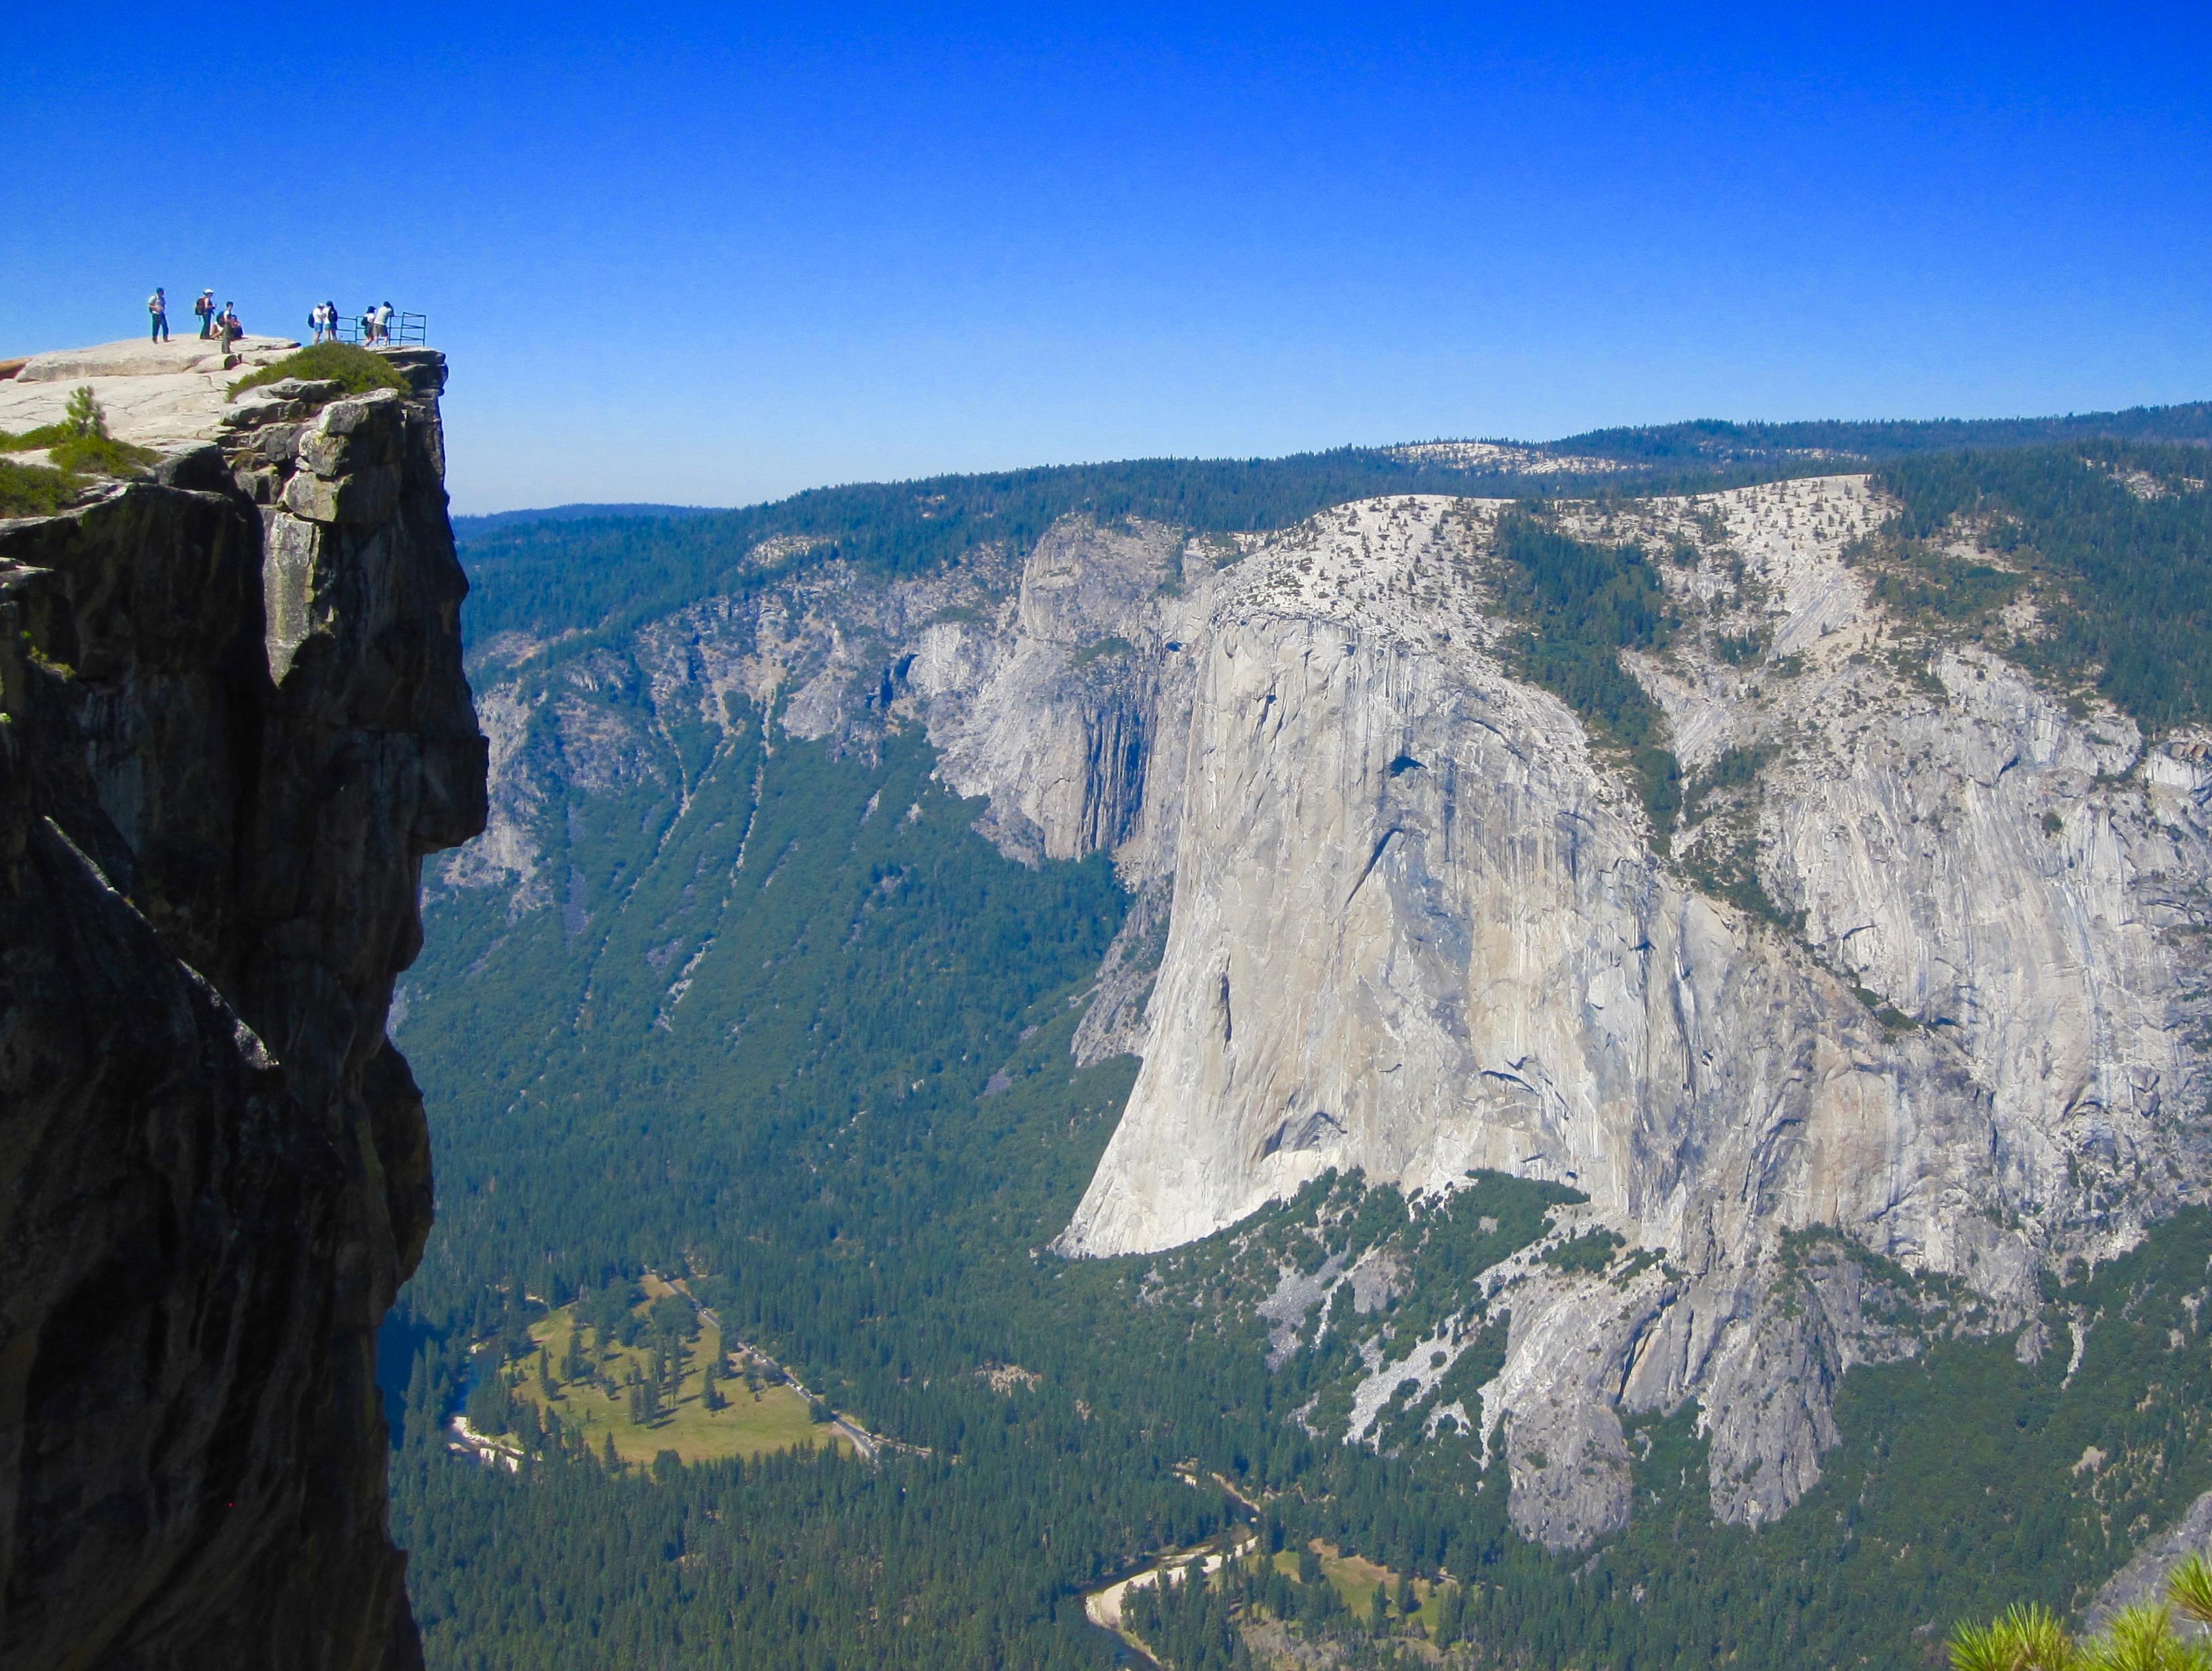 #18 Yosemite National Park